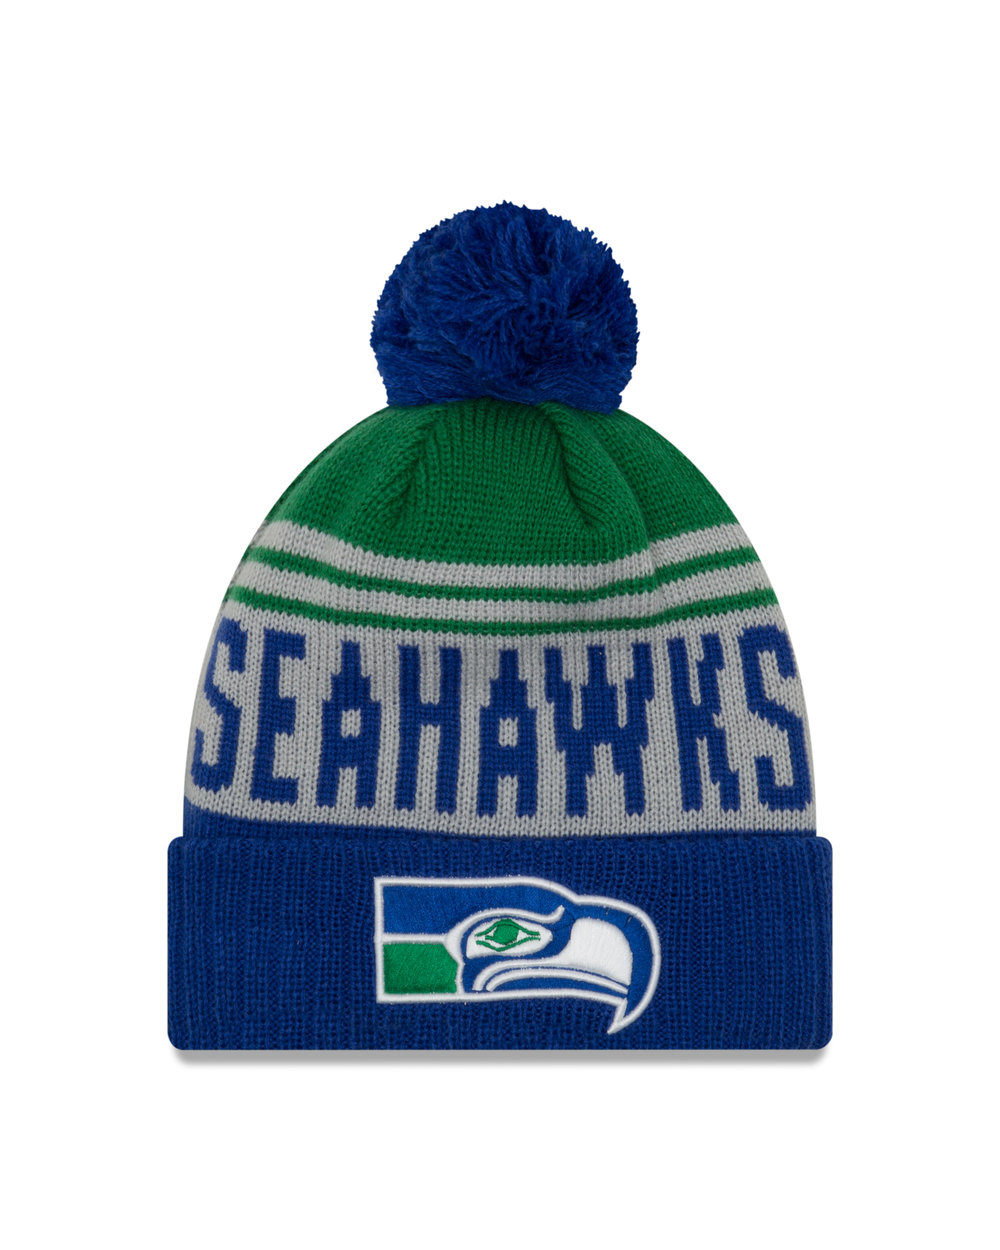 ab8c52986bb ... where to buy seattle seahawks 2018 retro team pride knit beanie 4e019  43957